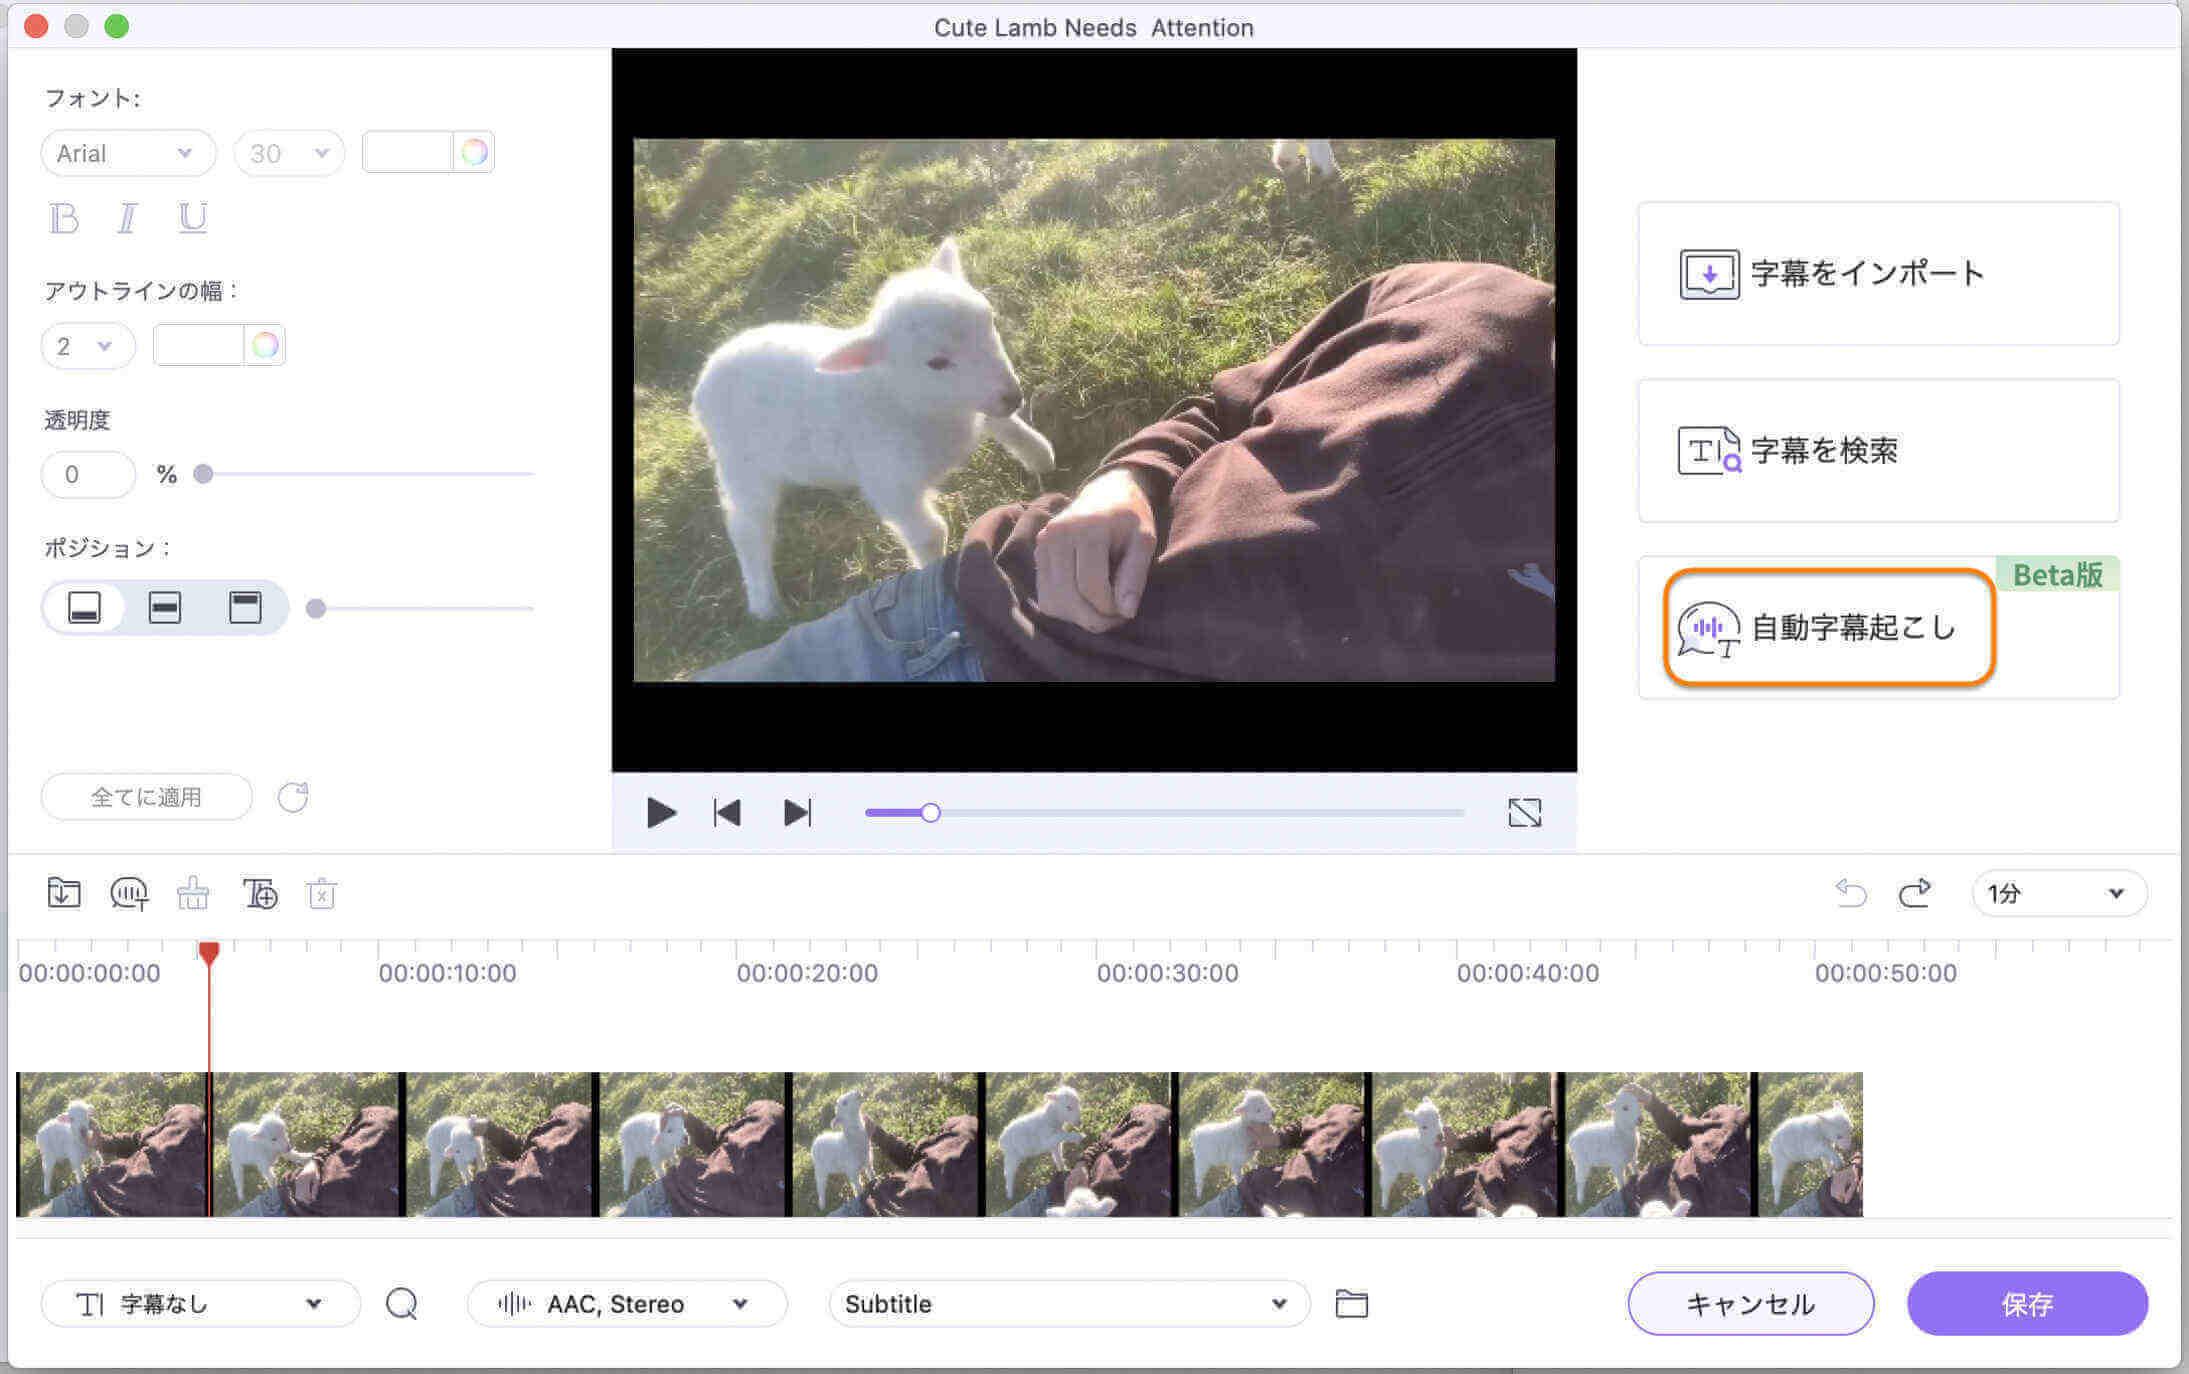 https://images.wondershare.jp/uniconverter/13-guide/subtitle-editor-mac-1.png